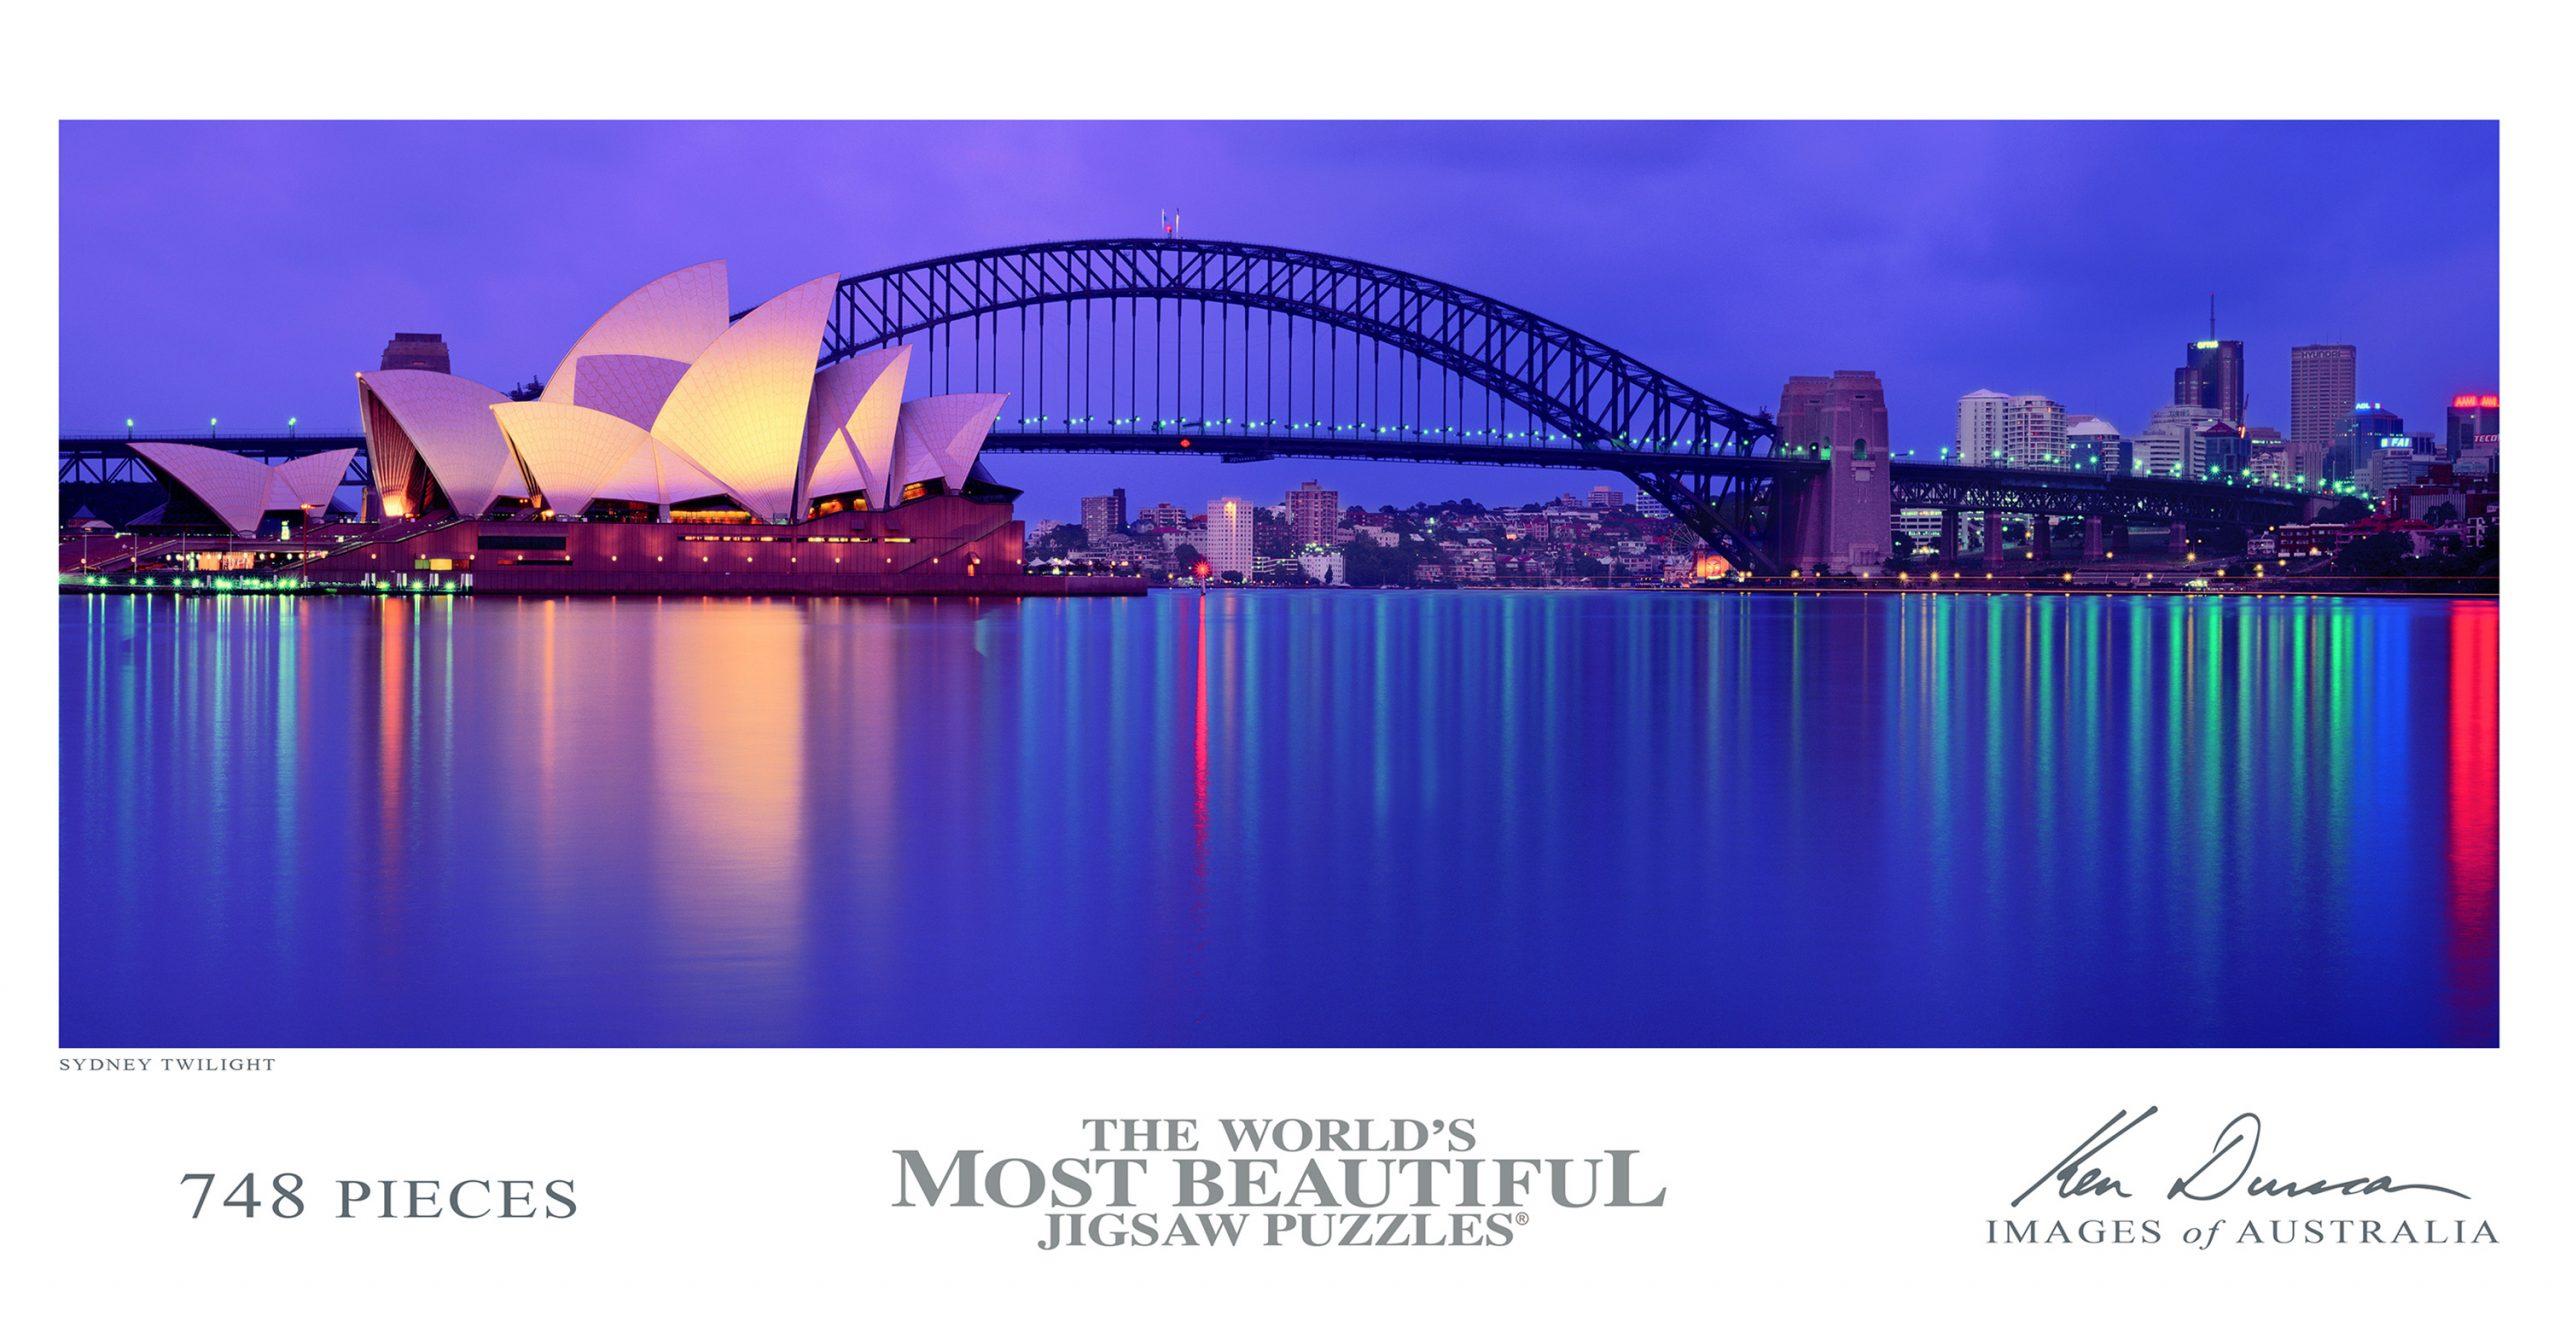 Ken Duncan Images Of Australia - Sydney Twilight